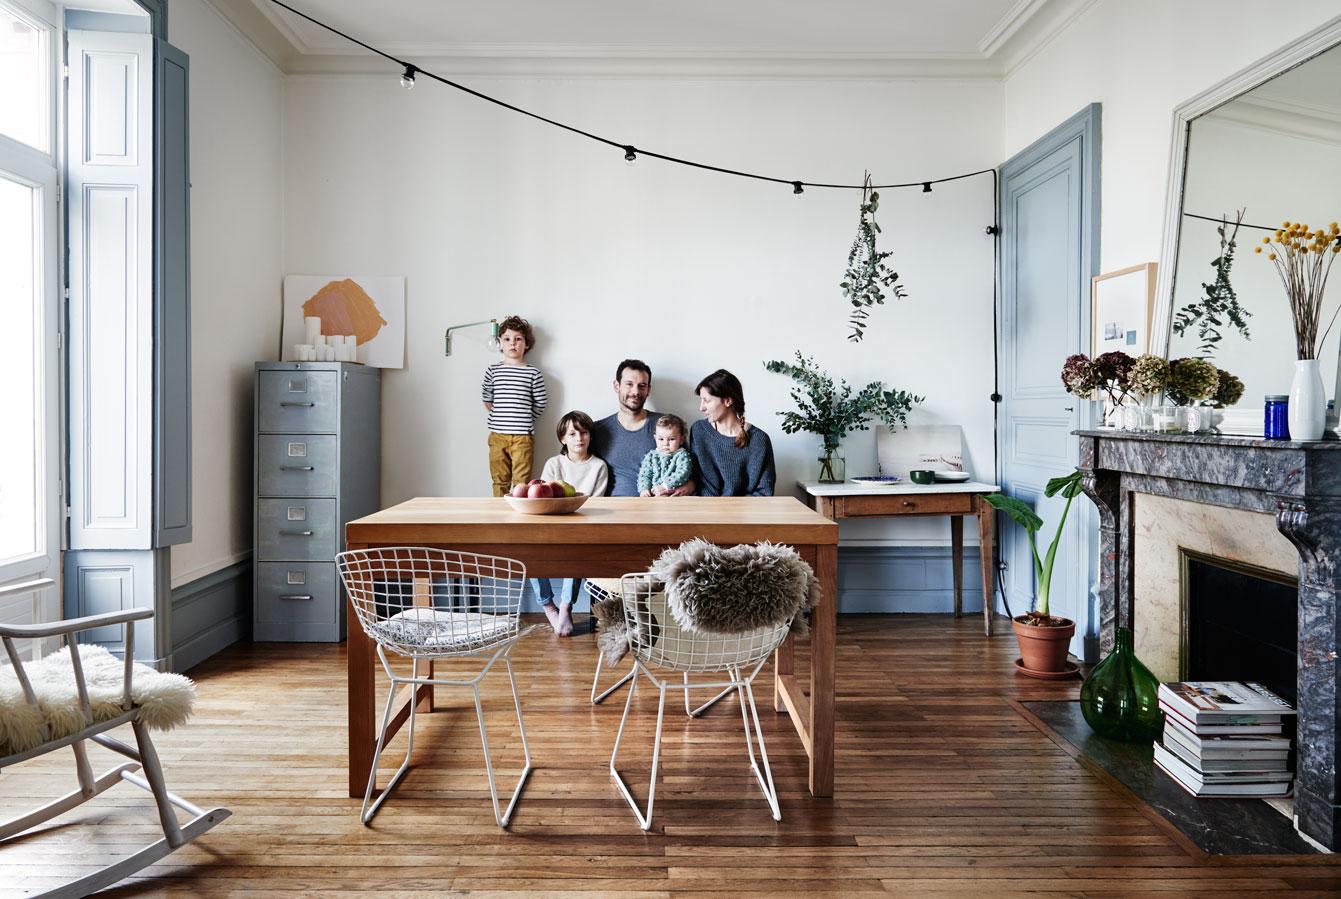 Enchanting family home in Nantes, France